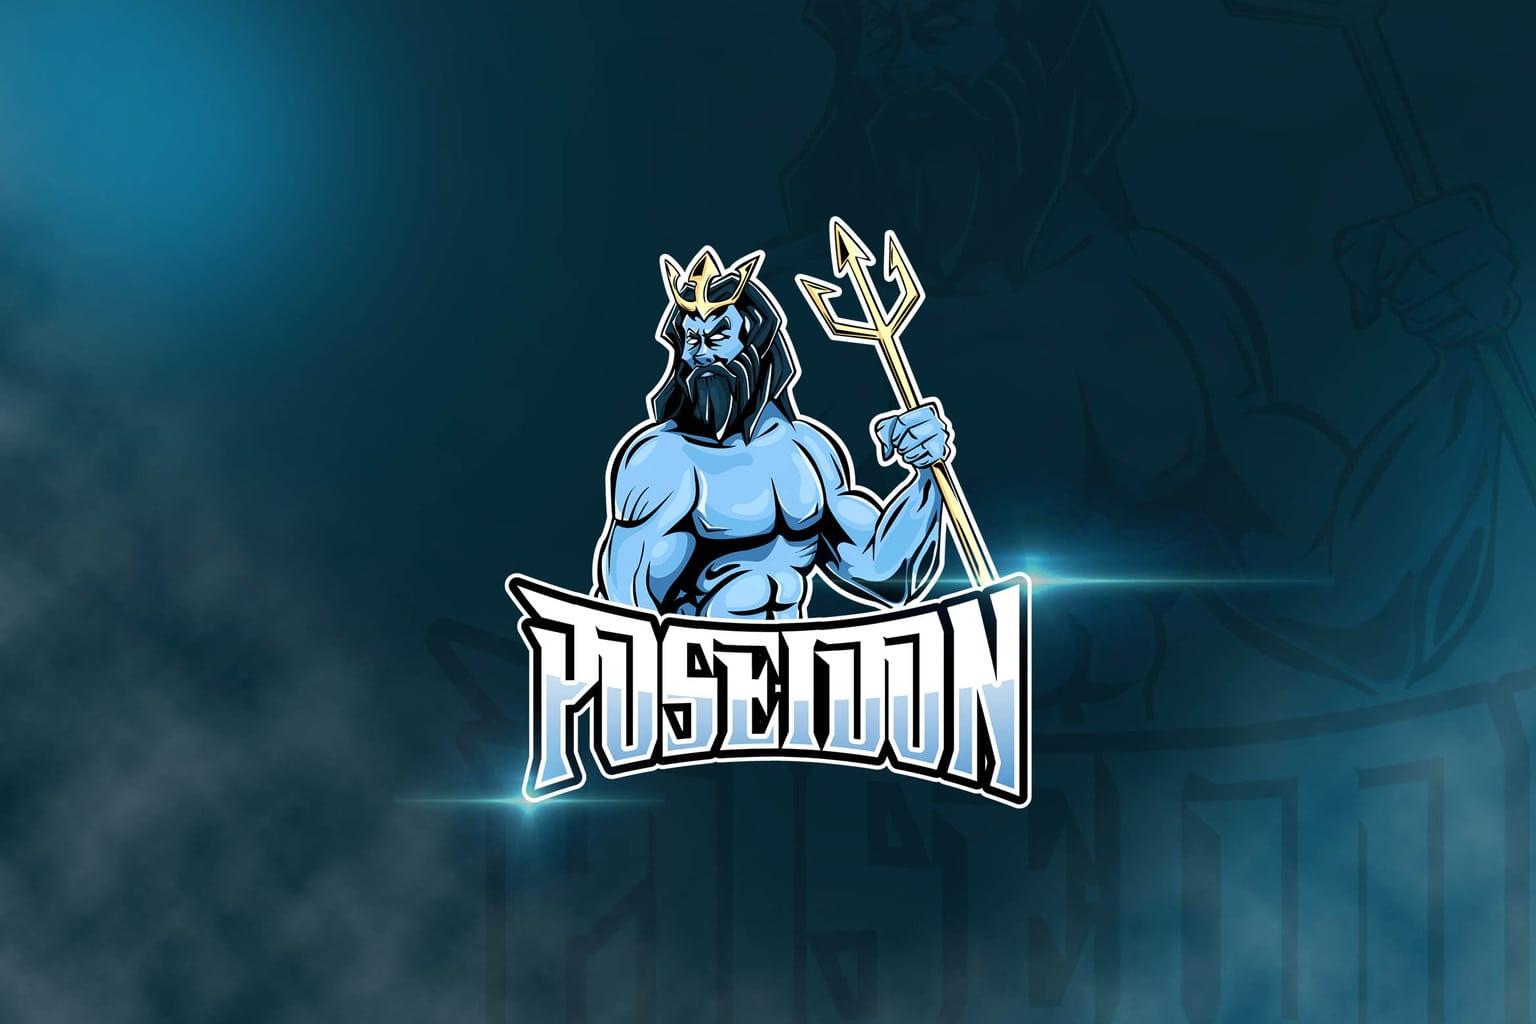 esport logo the poseidon